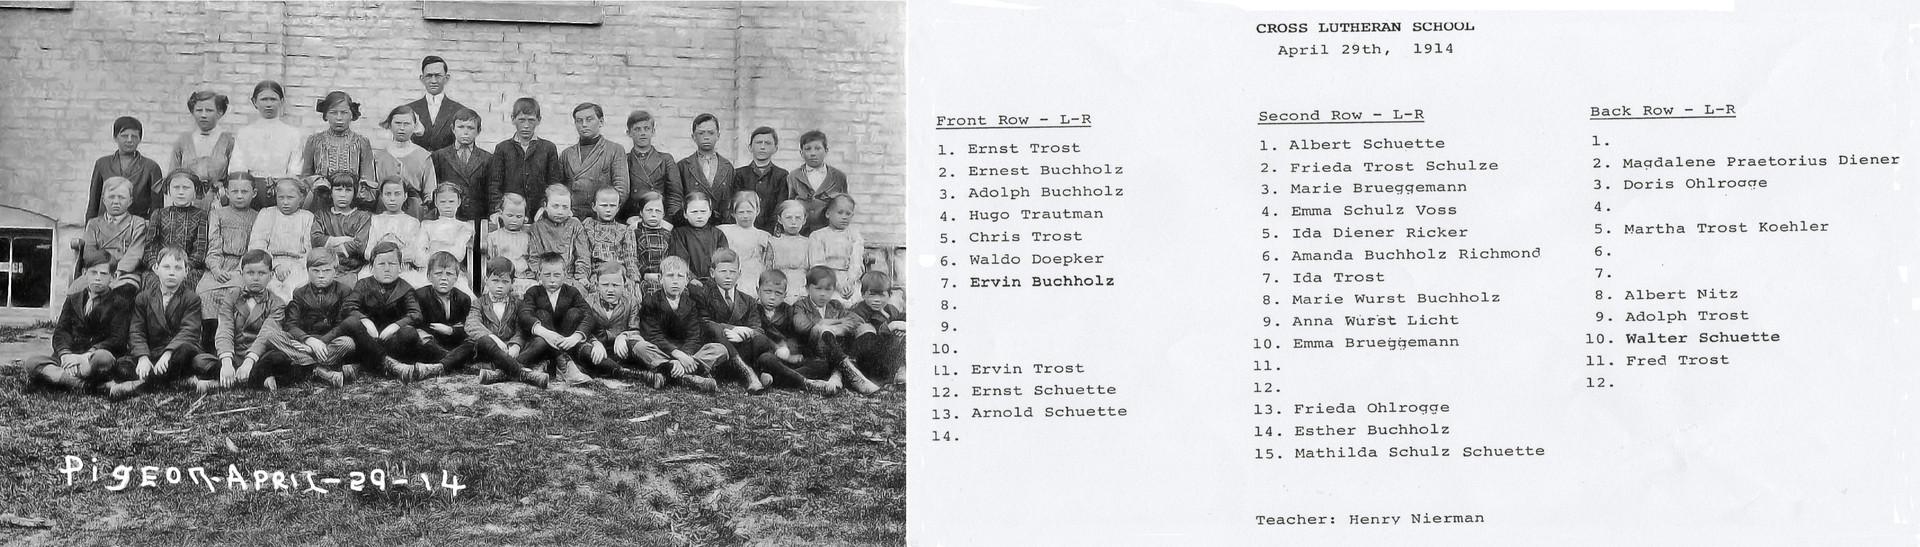 1914 Cross Lutheran School 02_edited-2.j